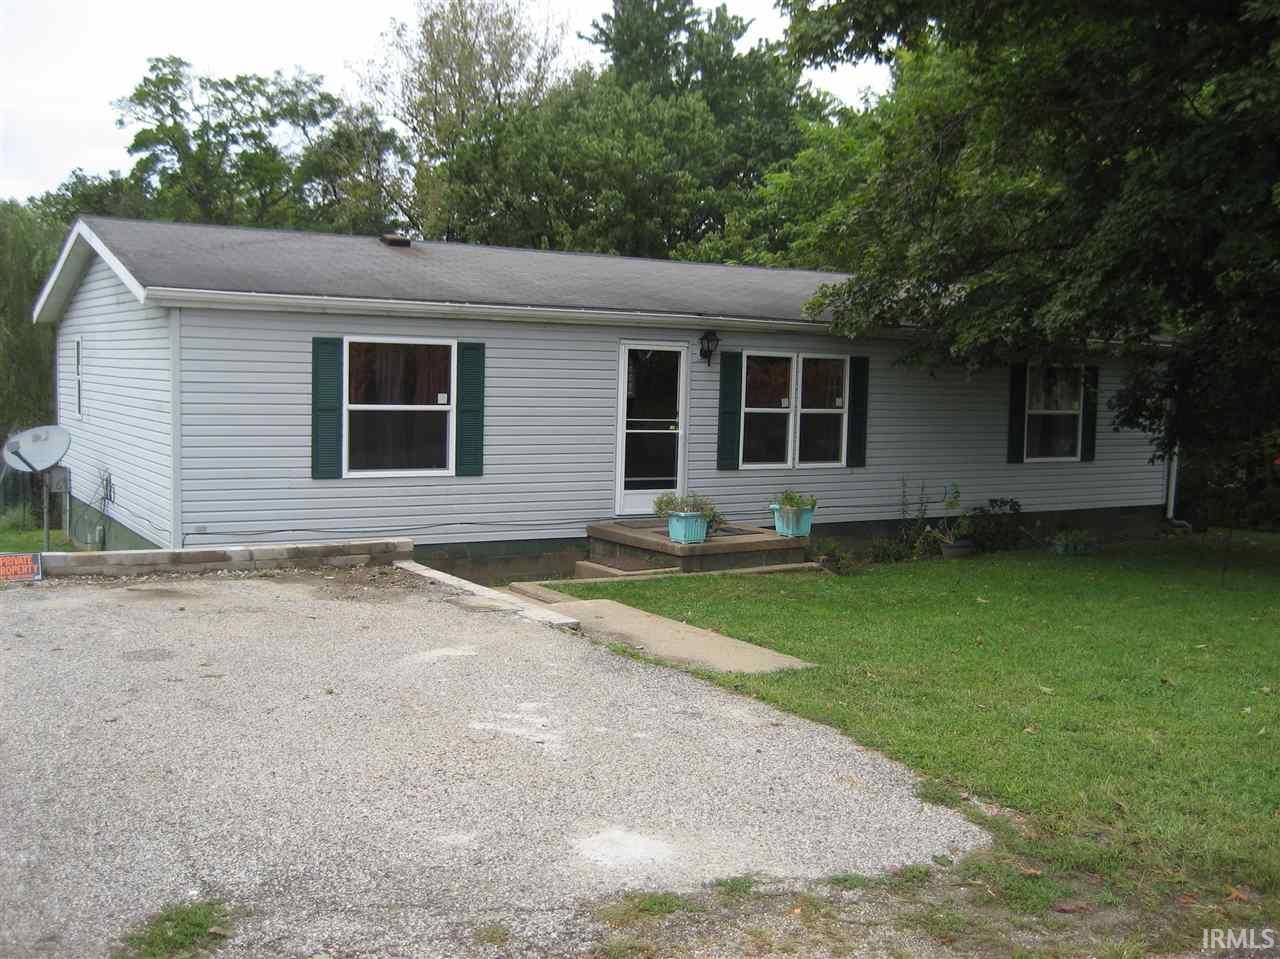 2310 Old Evansville, New Harmony, IN 47631